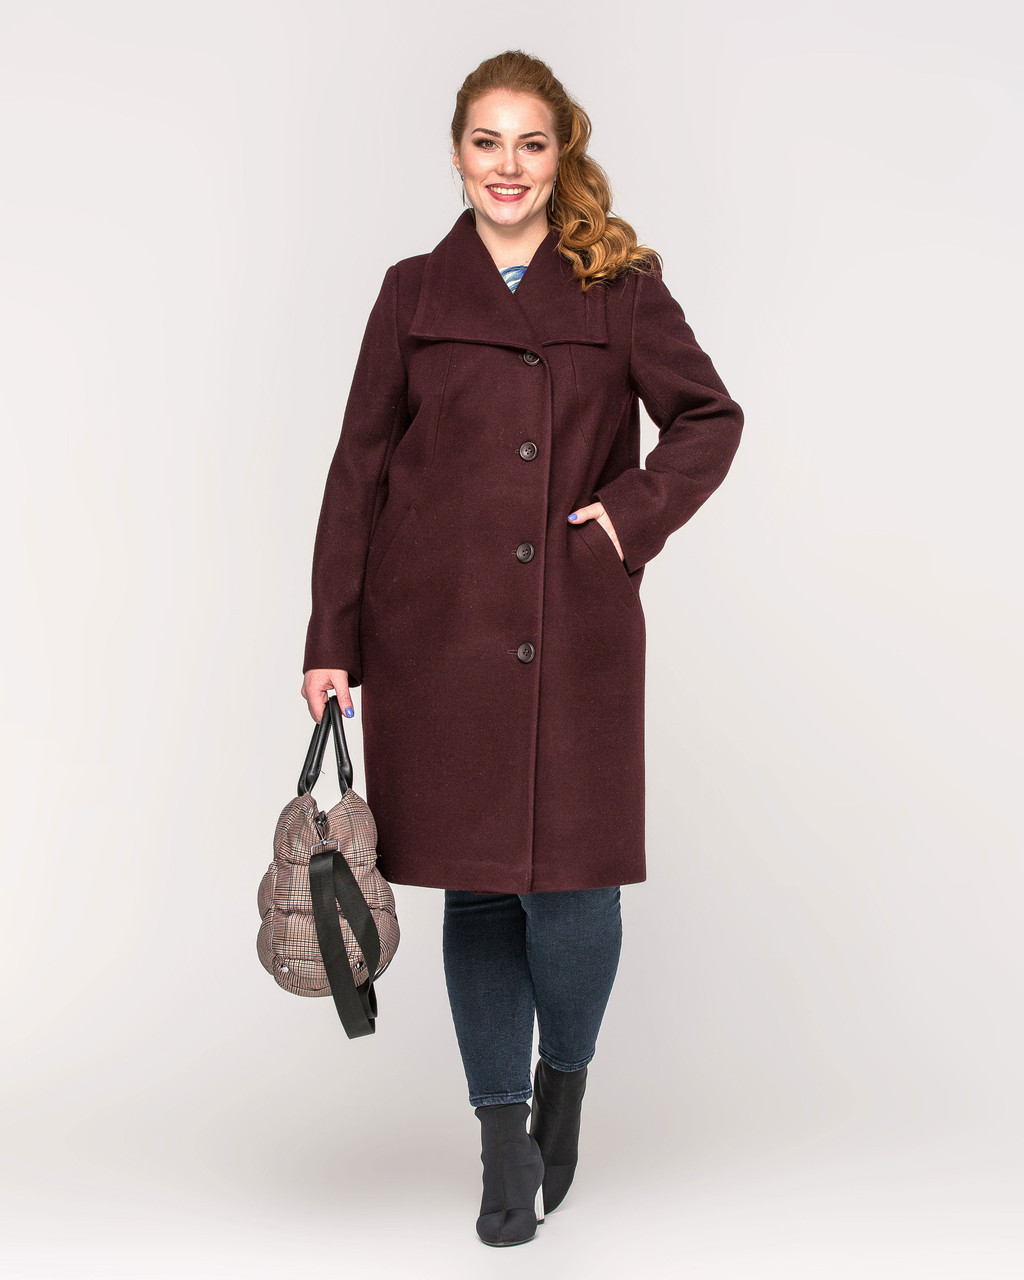 Пальто жіноче з 52 по 64 р. Весна 2020